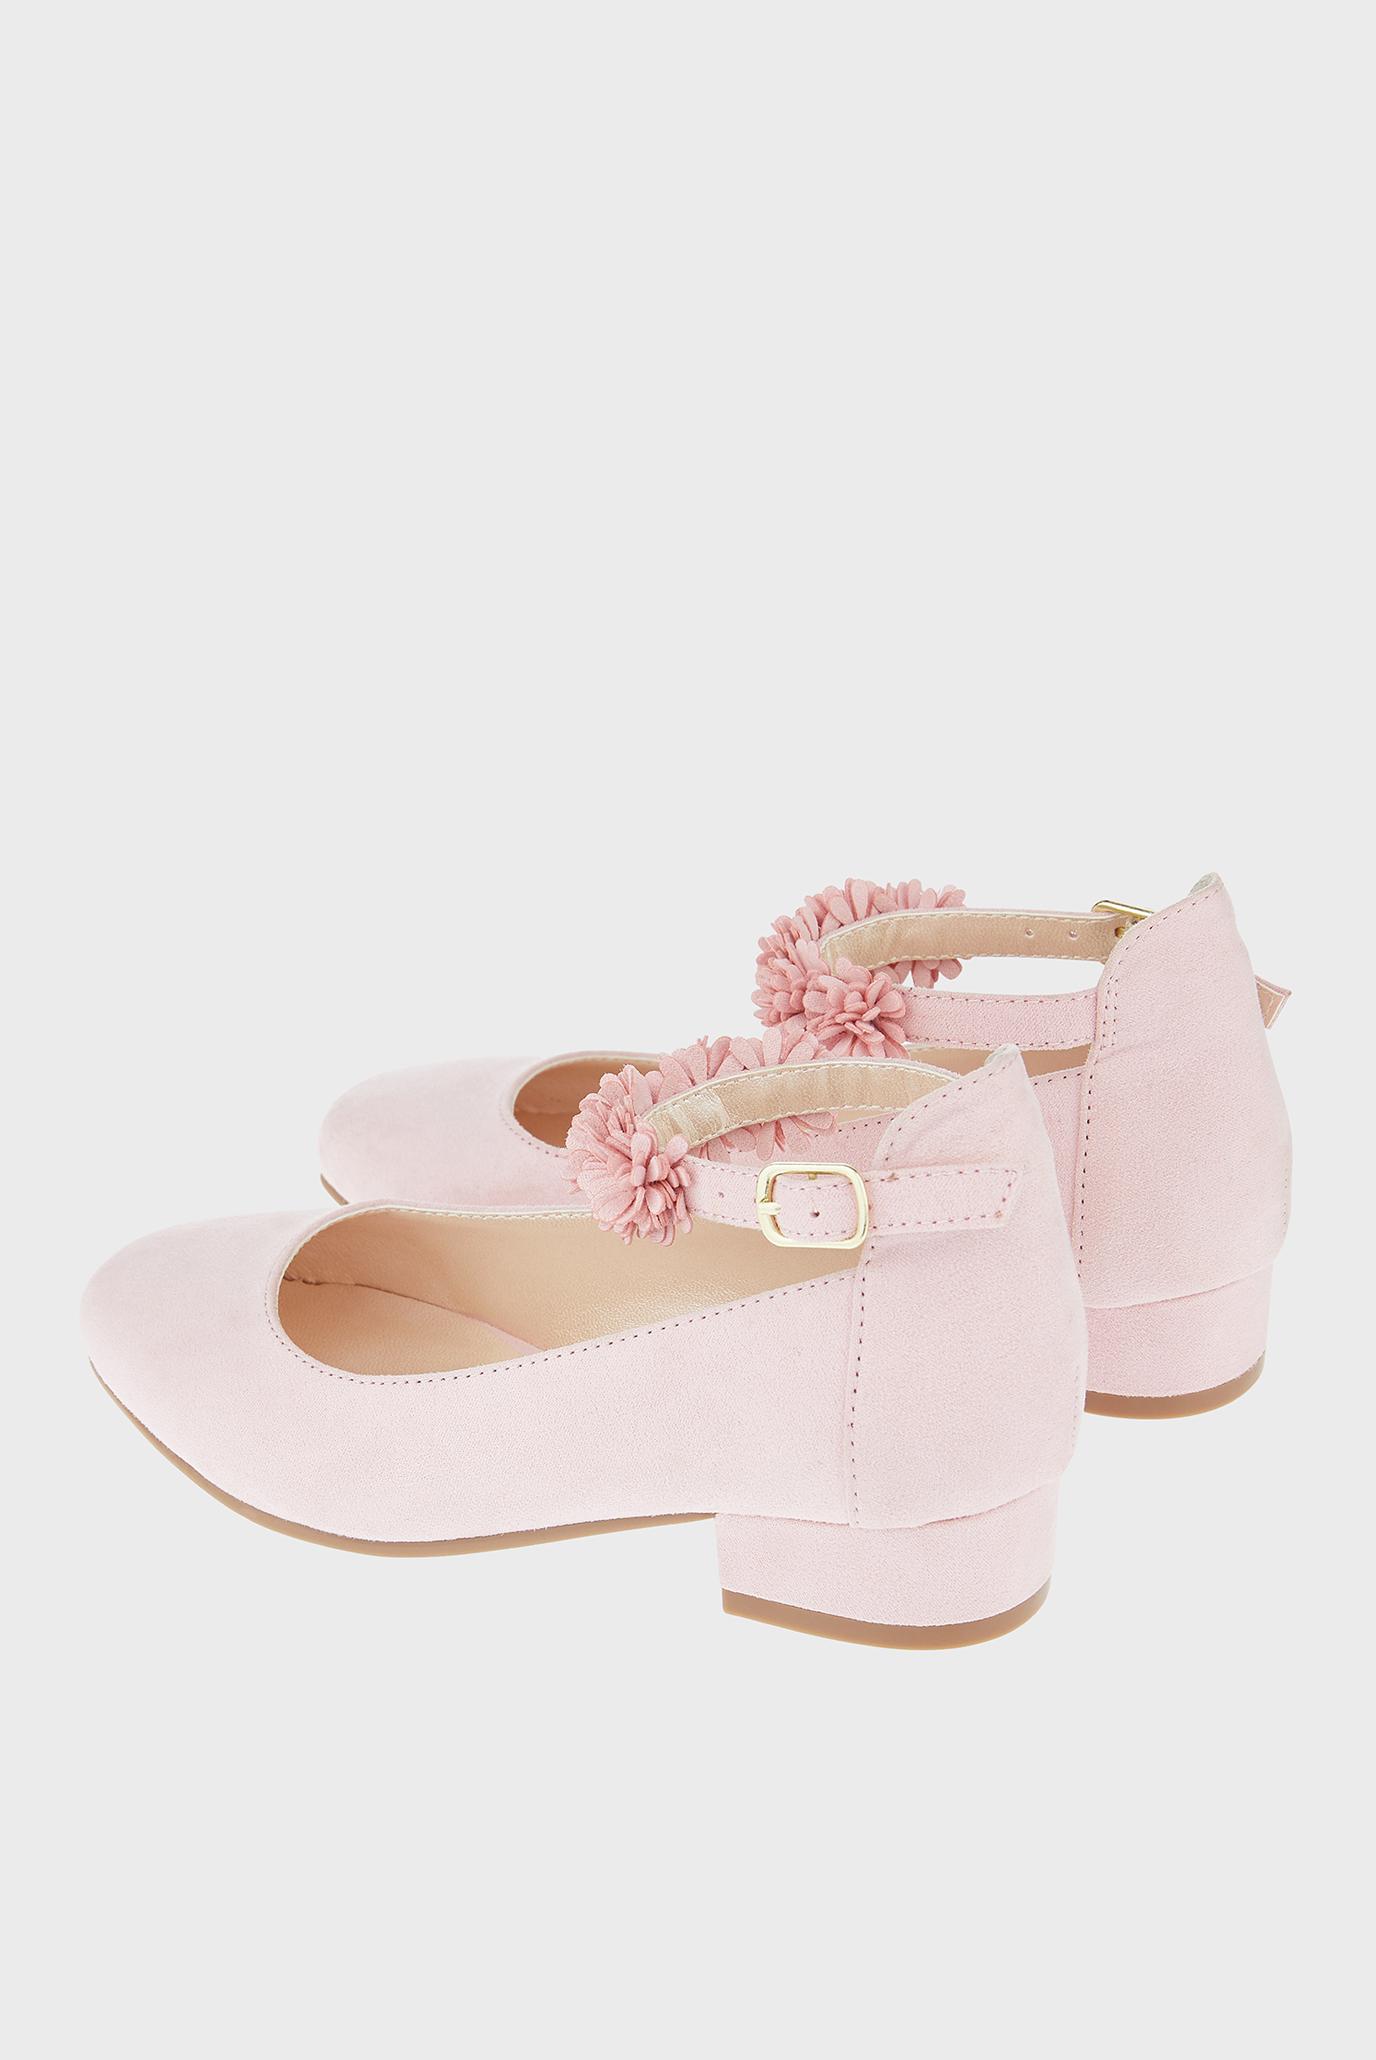 f8e8155b Купить Детские розовые туфли THEA FLORAL STRAP Monsoon Children Monsoon  Children 511035 – Киев, Украина. Цены в ...